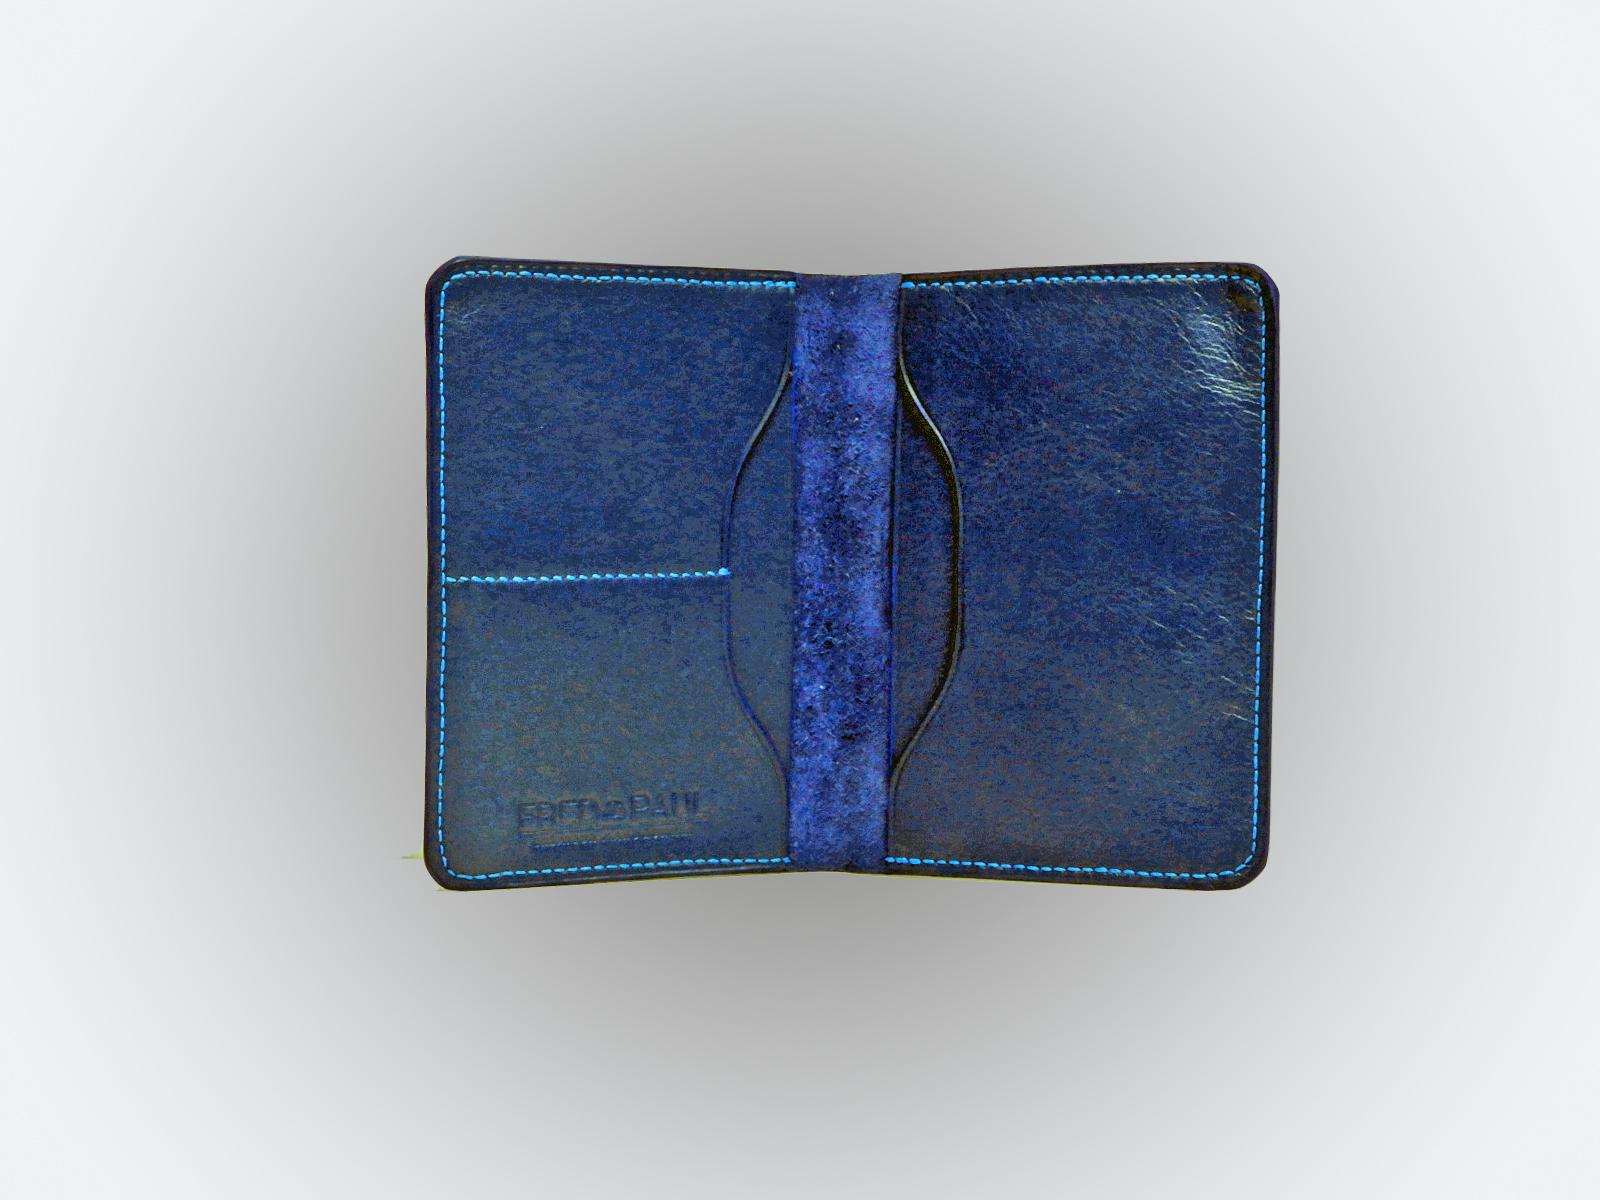 BALI, protège passeport en cuir de veau bleu jean